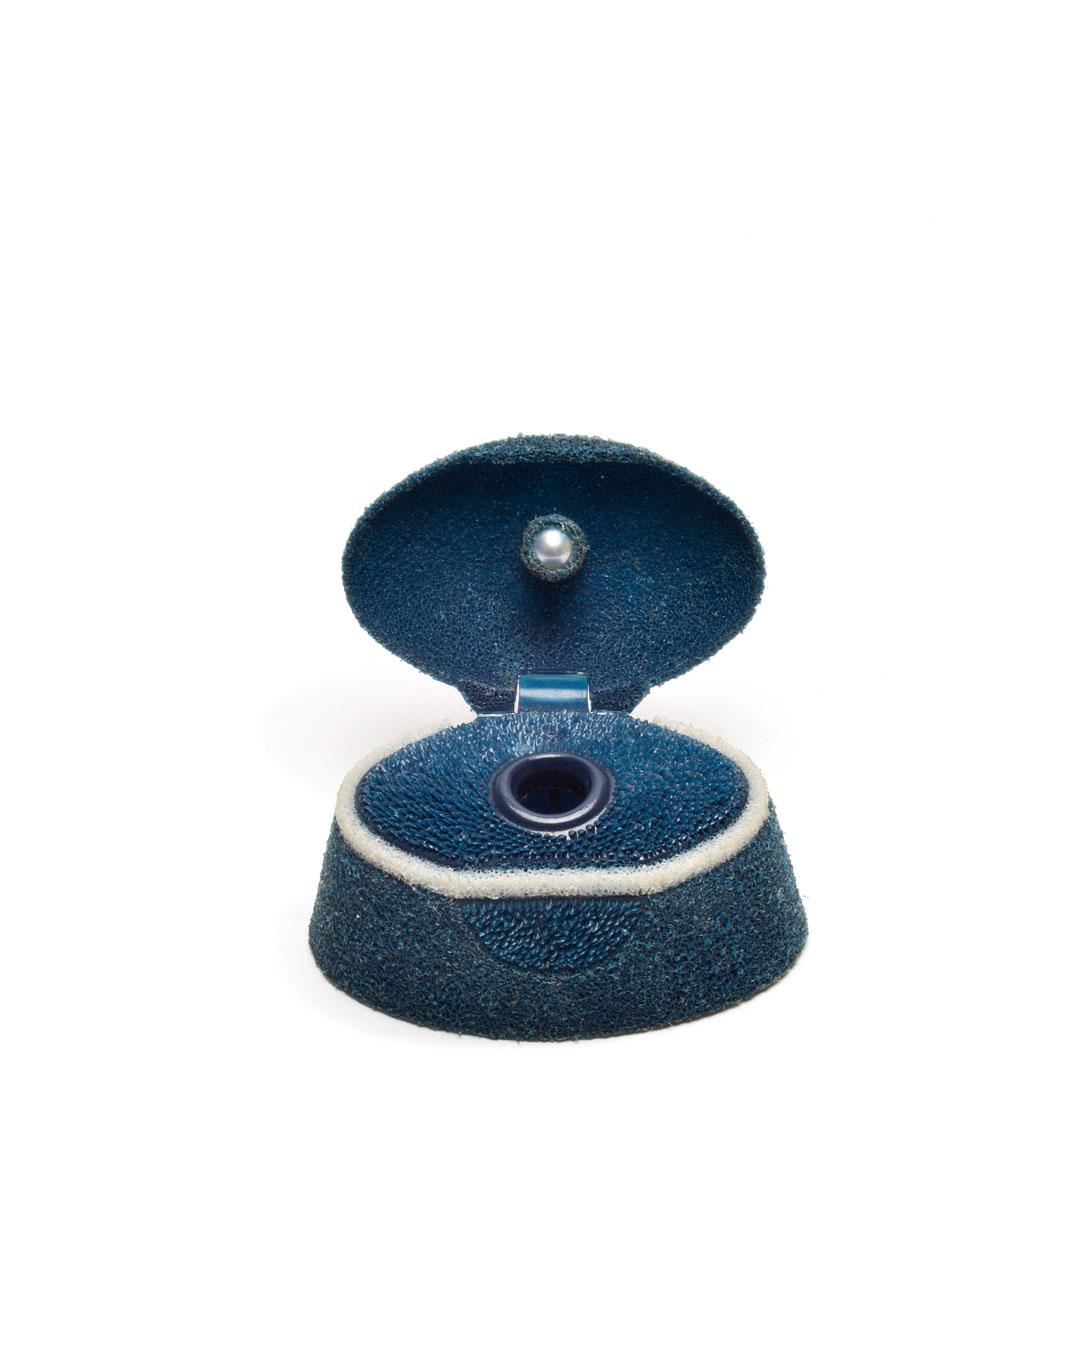 Ute Eitzenhöfer, Ensha, 2002, brooch; shampoo lid, pearl, rhodanised silver, silver, 40 x 40 x 45 mm, €1750